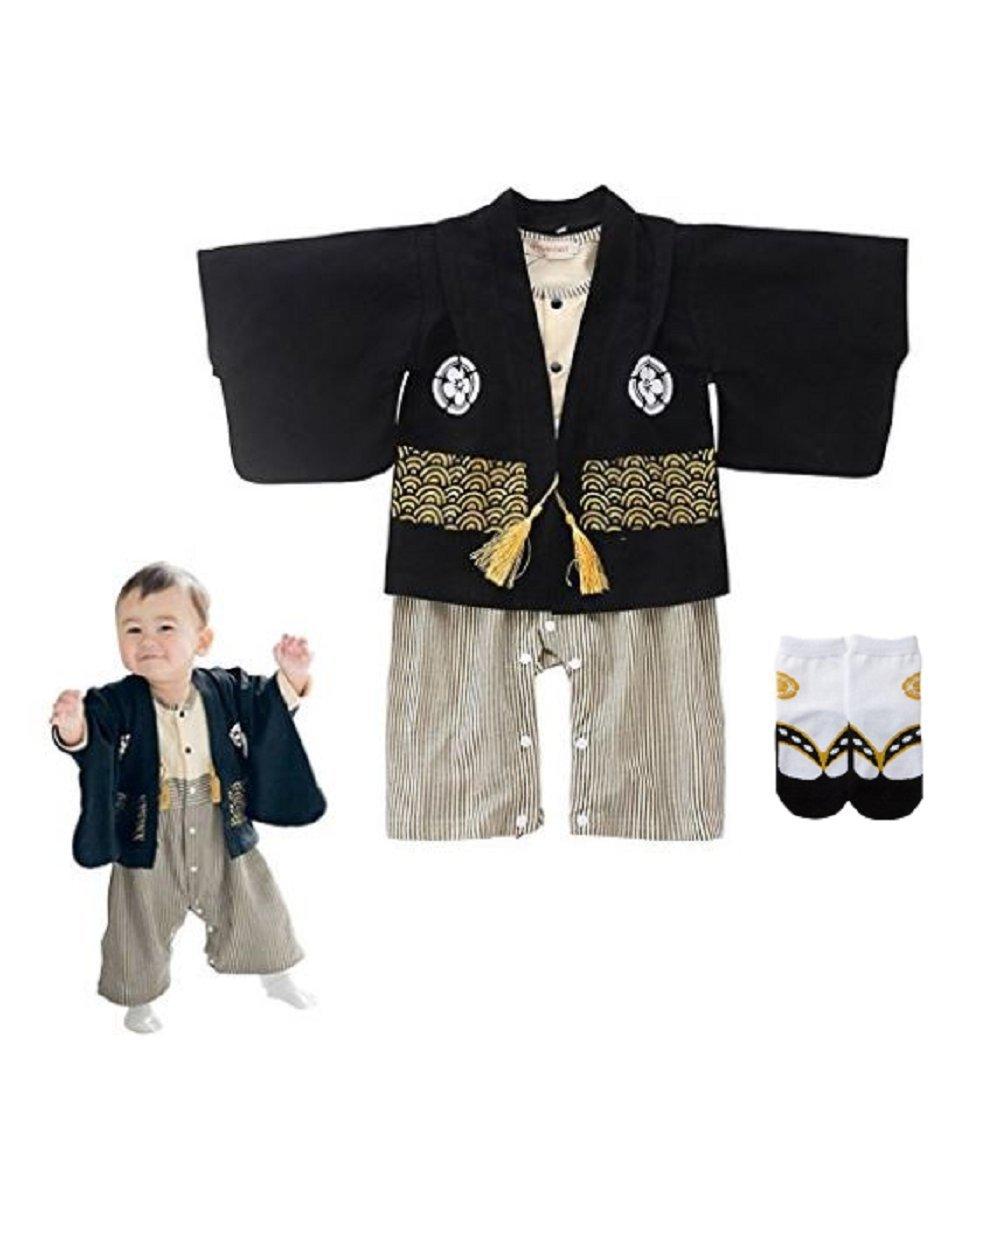 Baby toddler celebration costume for boys (Japanese Kimono) Japanese style socks included,Black Gold,18 Months - 24Months